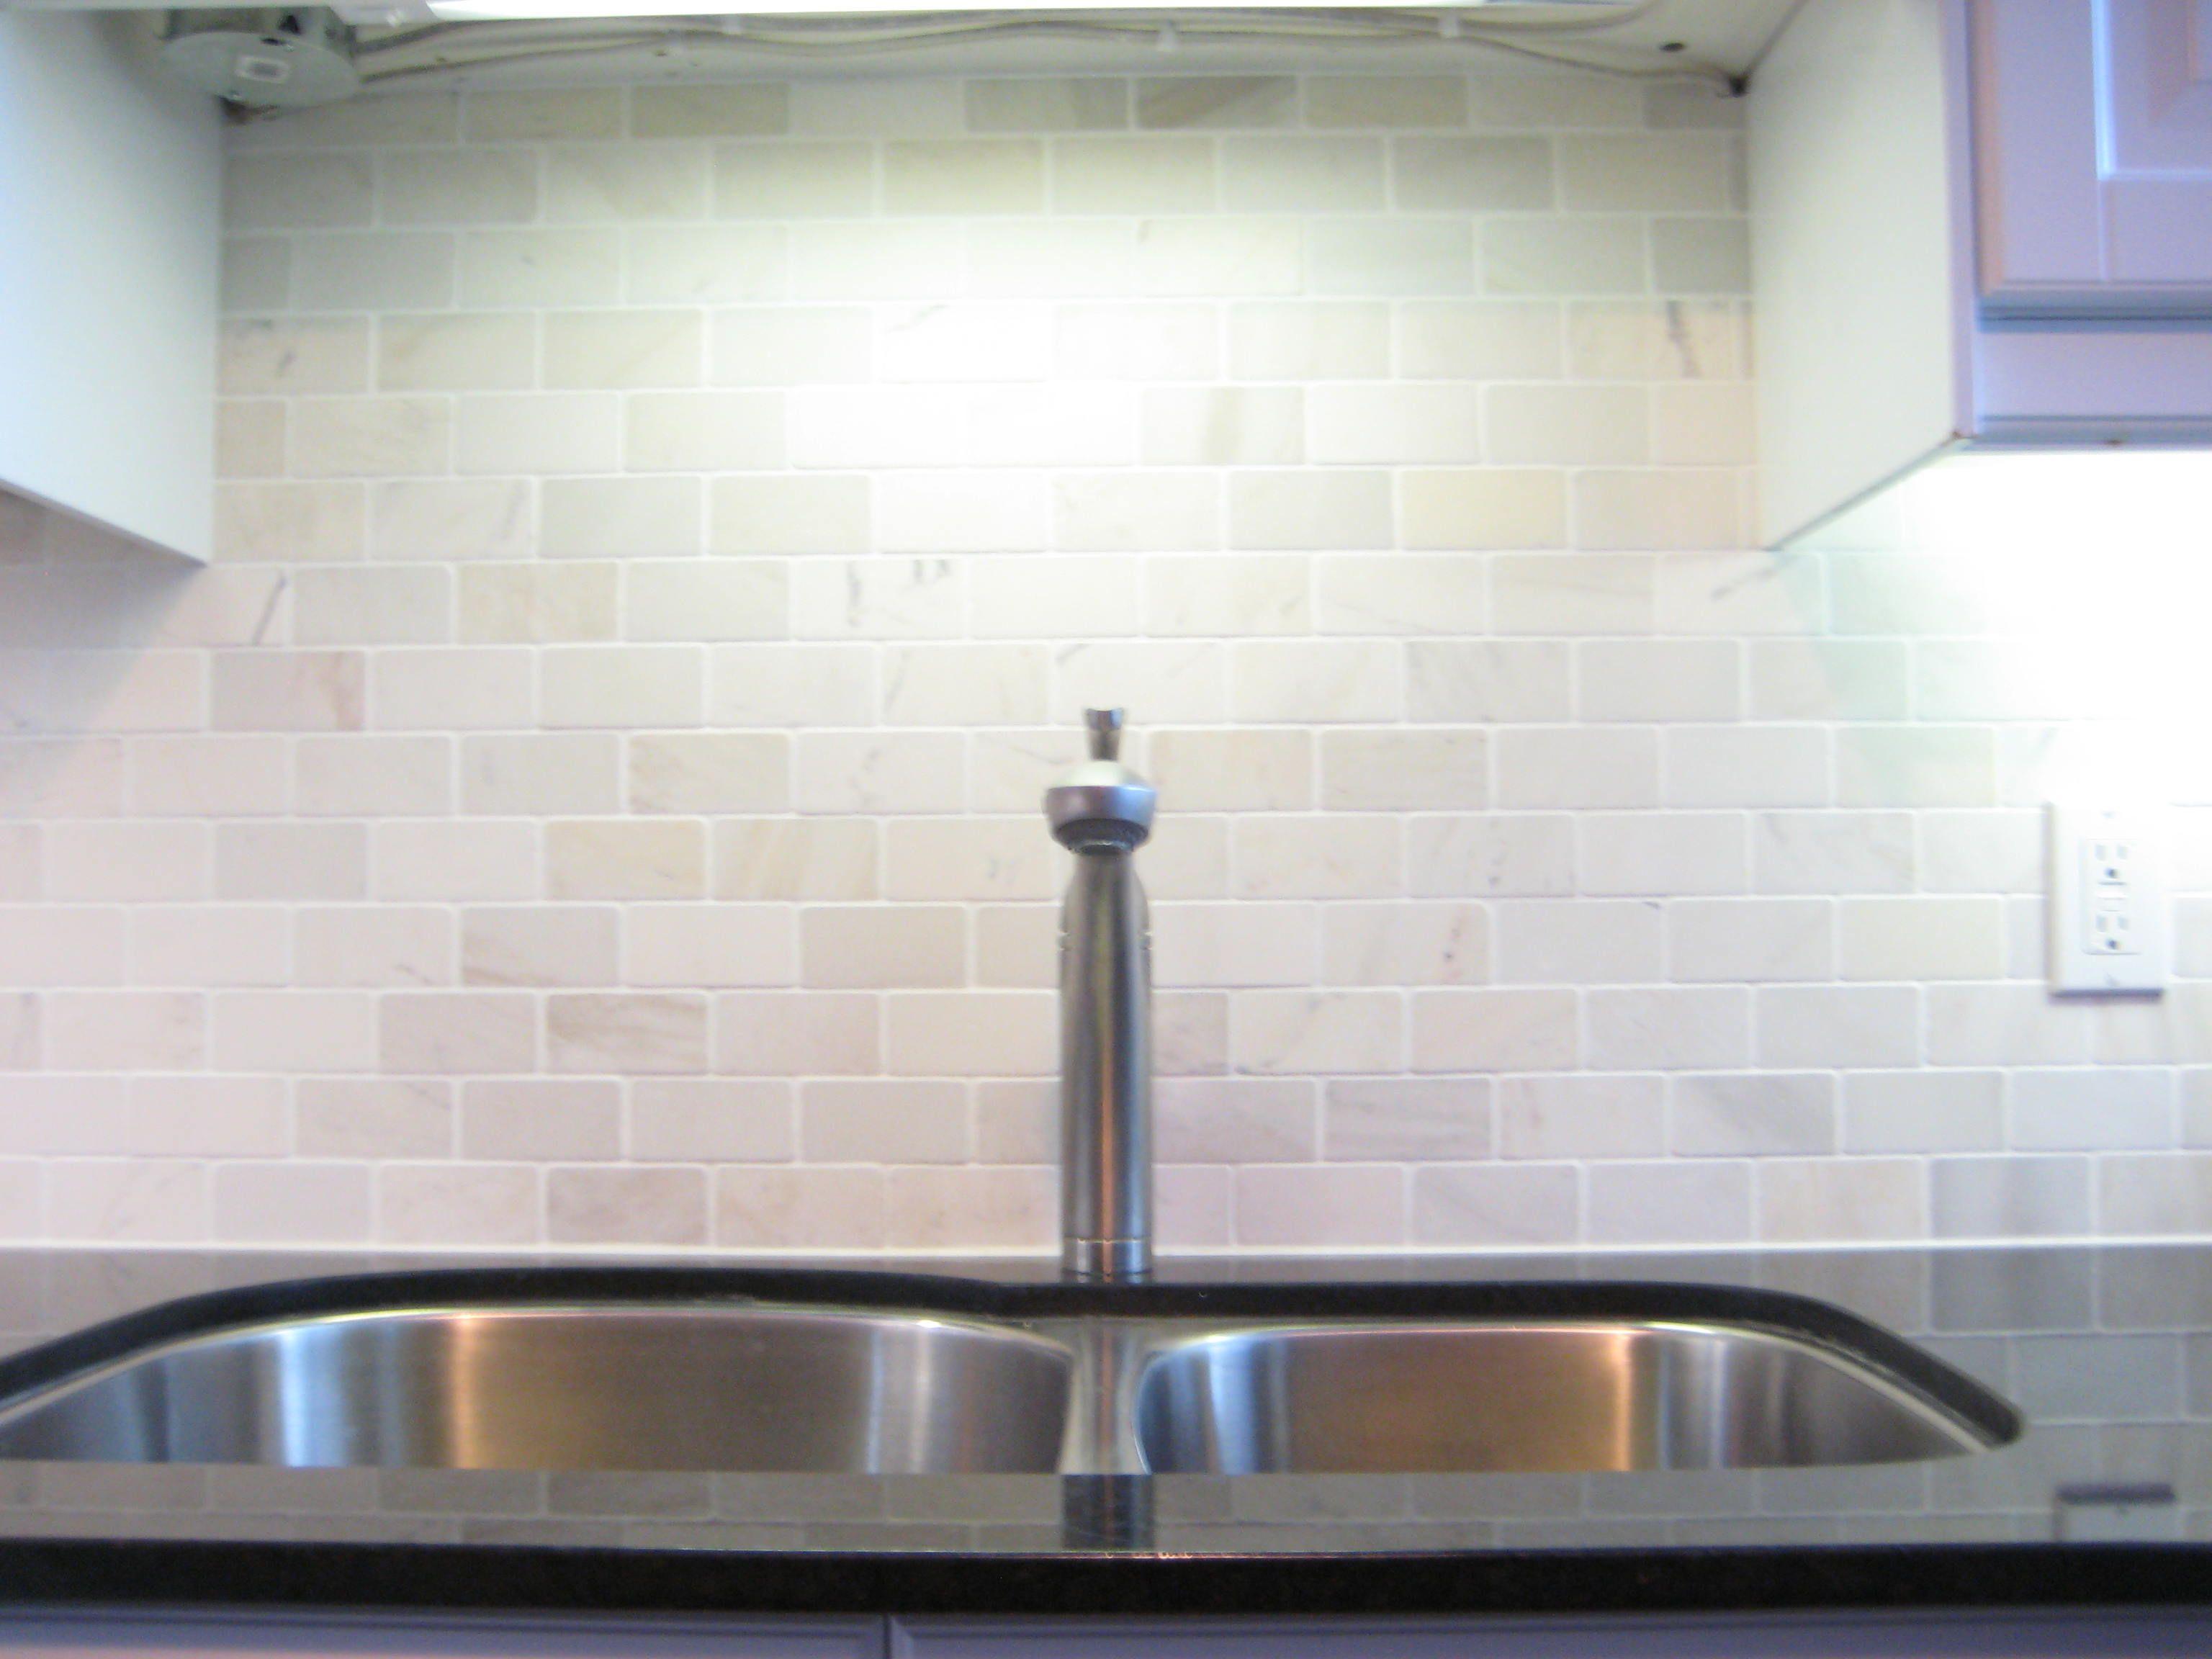 Kitchens, bathrooms, floors, walls, foyers